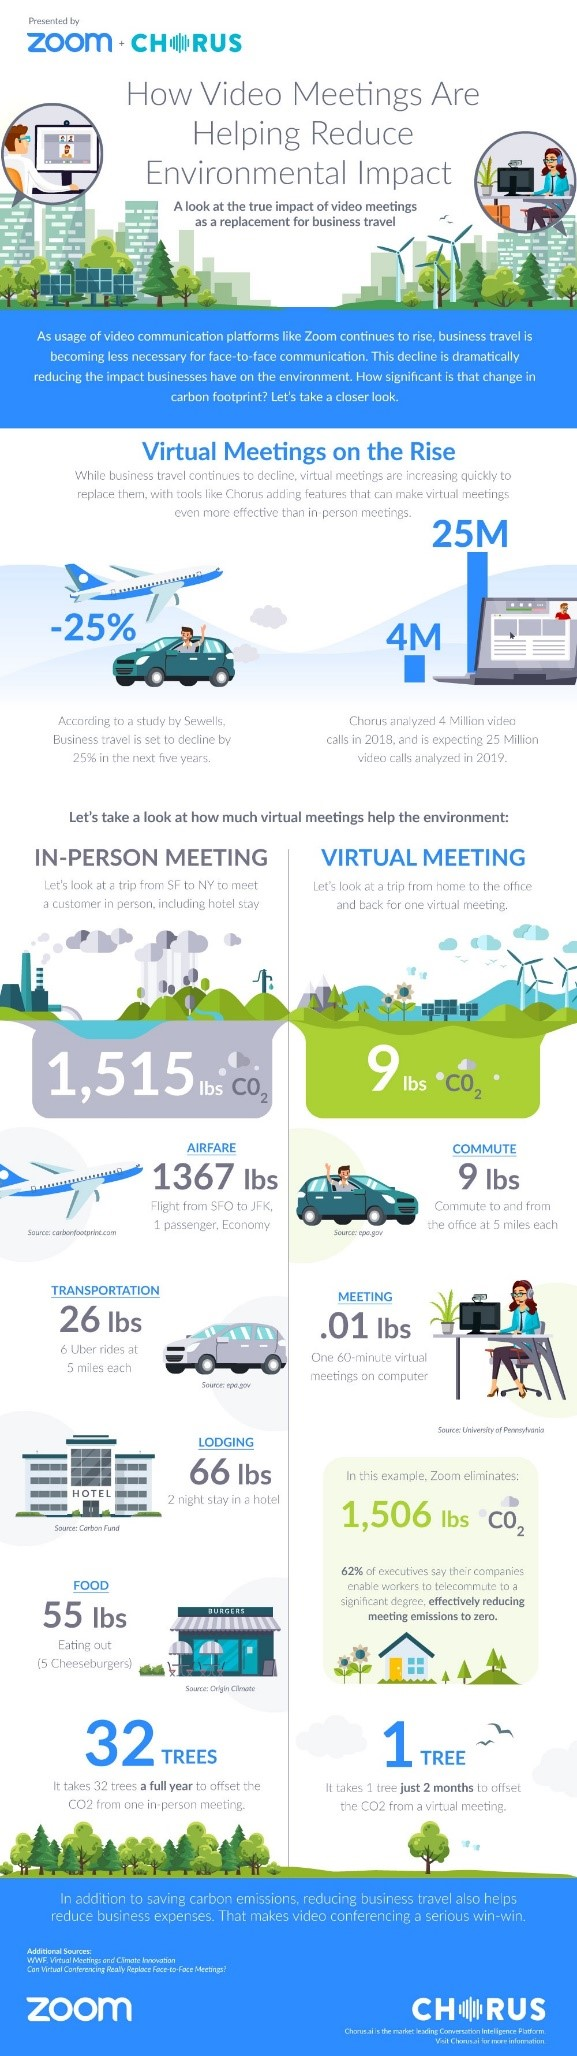 Zoom Video - Infographic